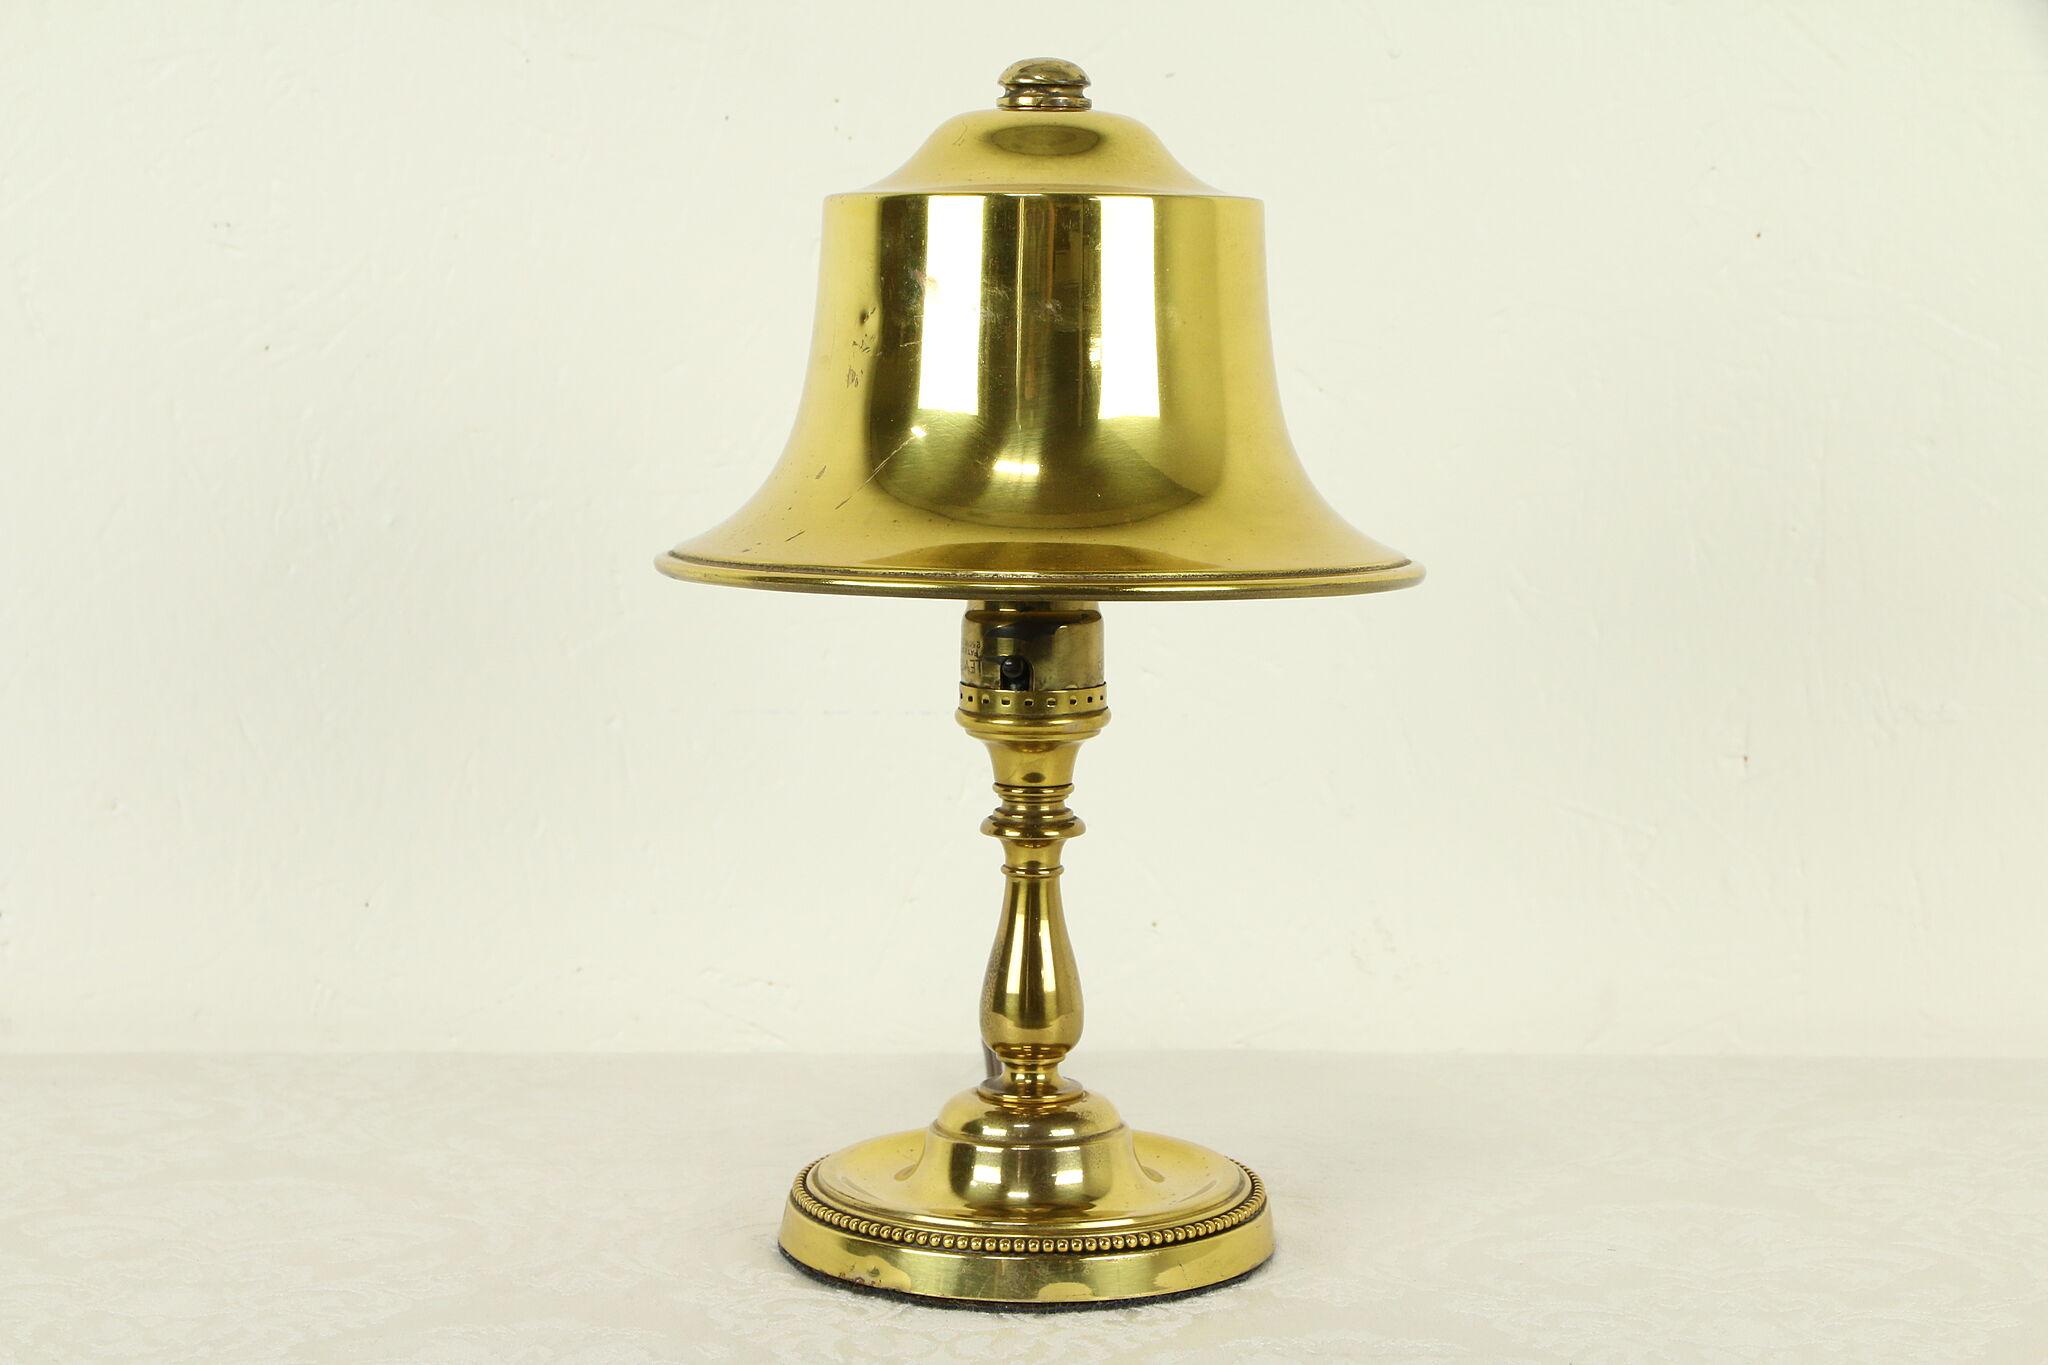 Br Antique 1920 S Desk Lamp Bell Shape Shade 31754